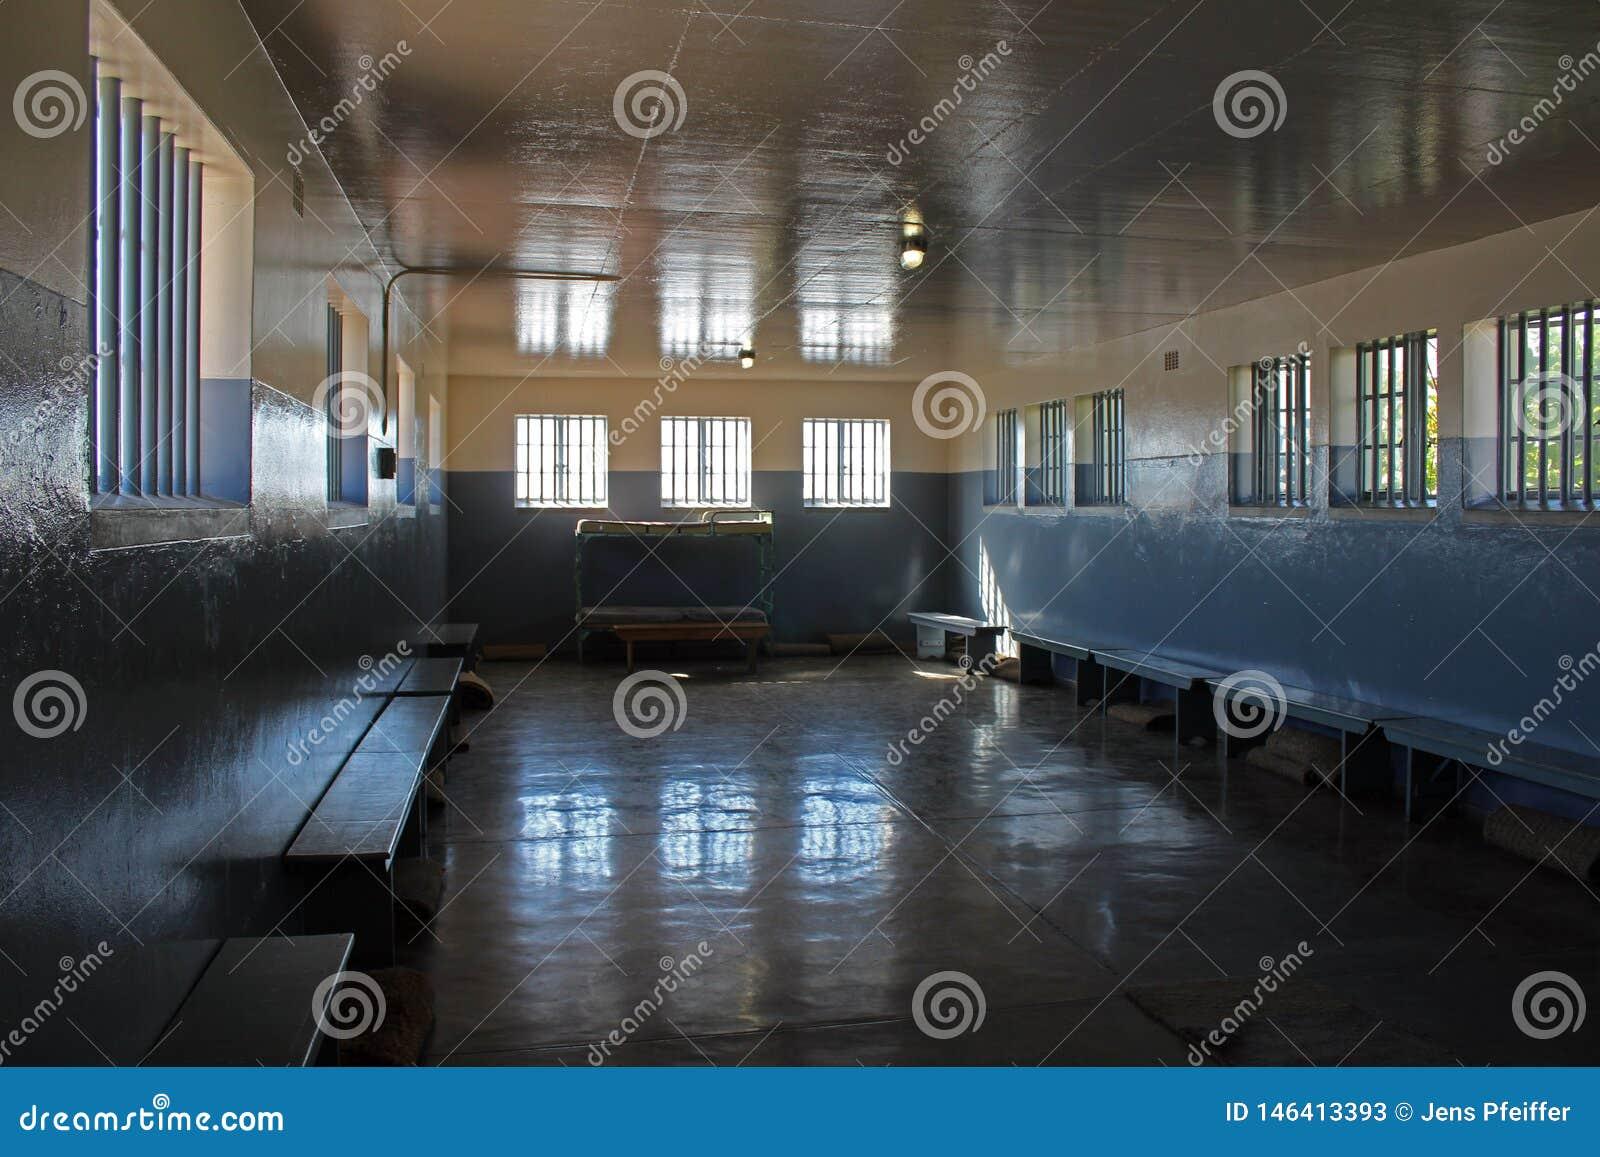 Крыло тюрьмы Нельсон Mandel, остров Robben, Кейптаун, Южная Африка